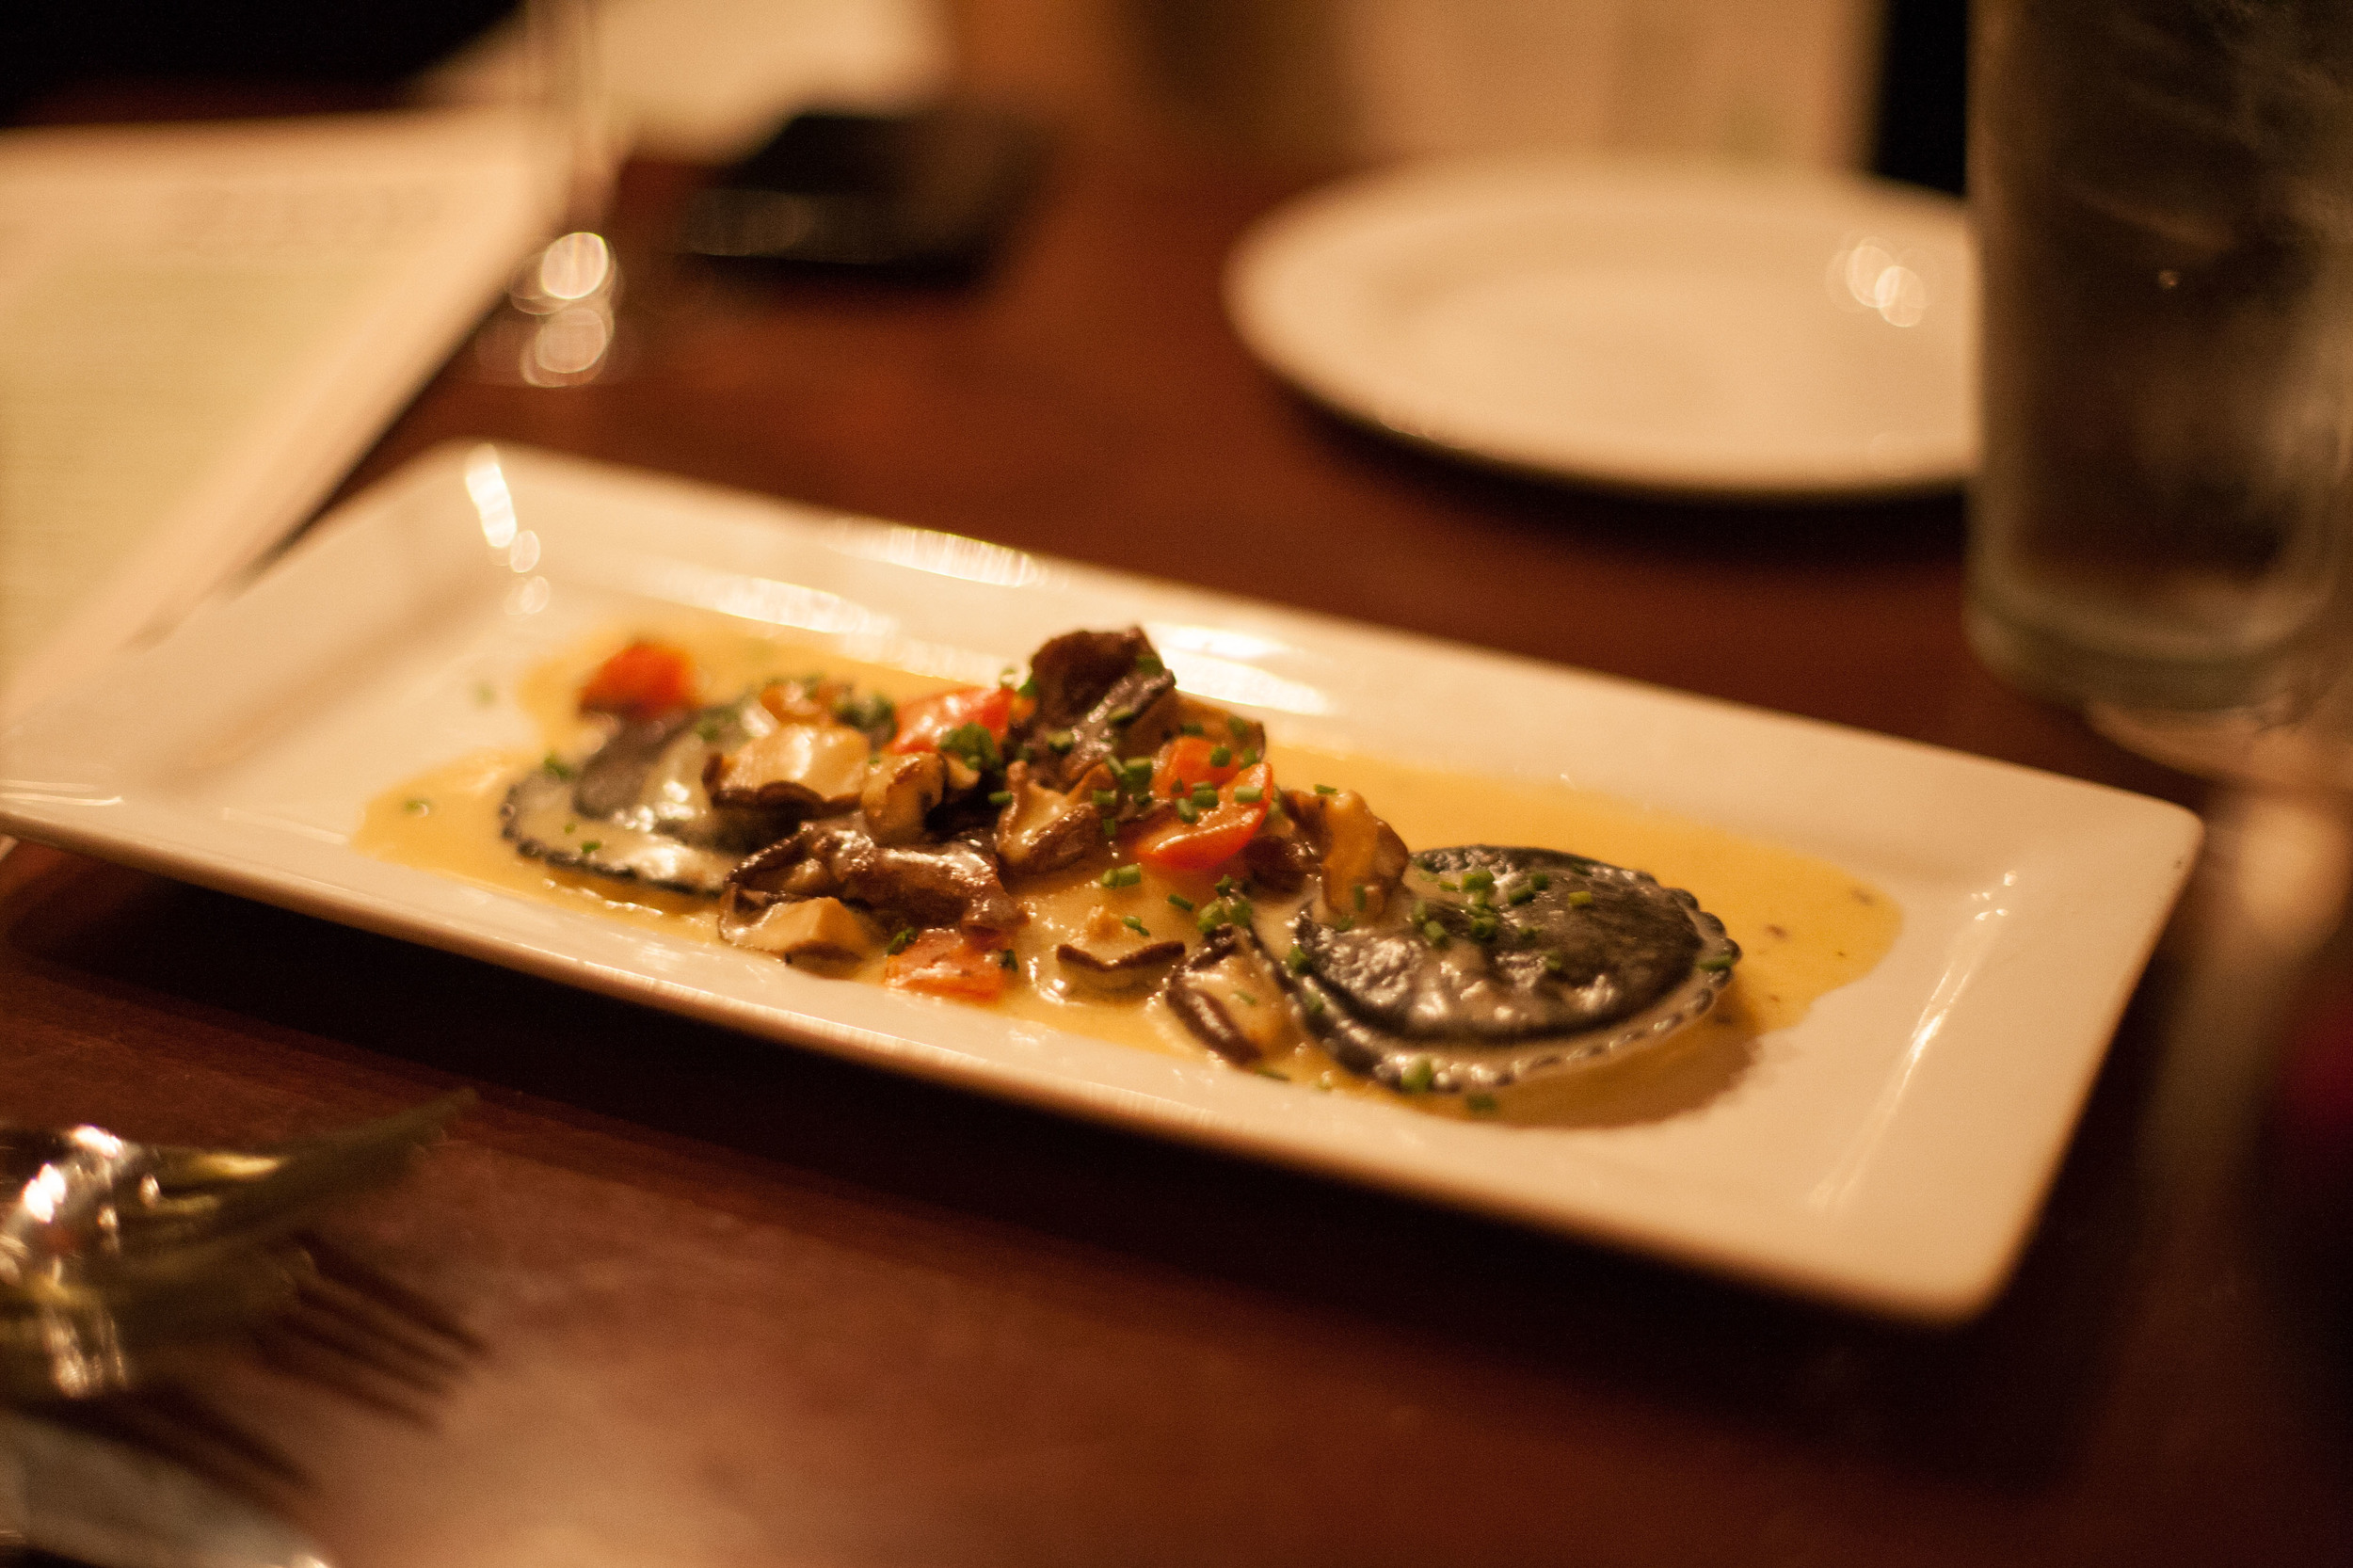 Black & White Lobster Ravioli: squid ink & egg pasta, shiitake mushrooms, sherry-lobster sauce.